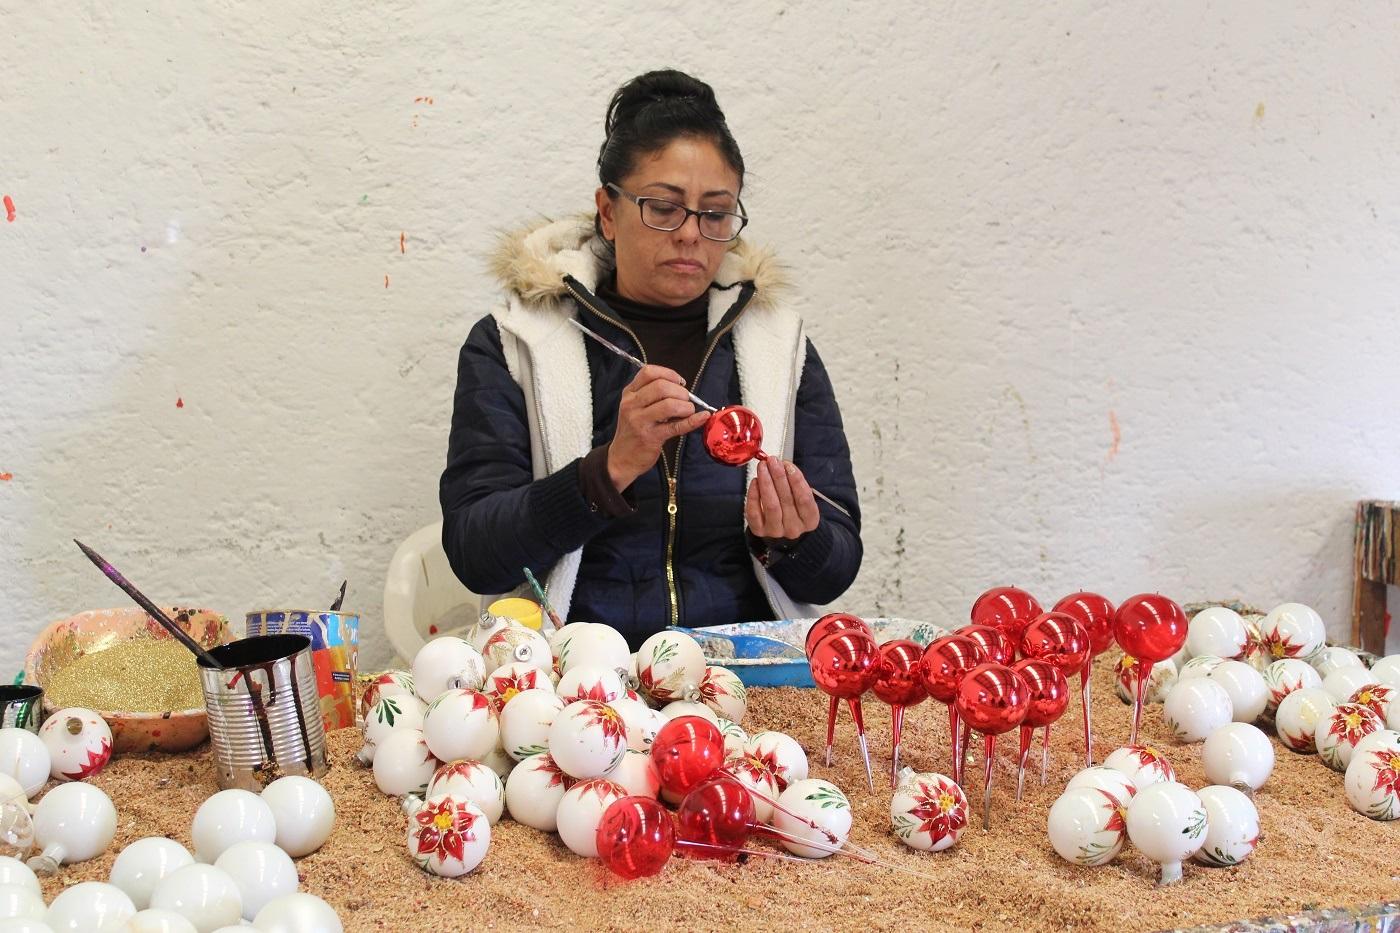 esferas-navideñas-tradicion-mexiquense